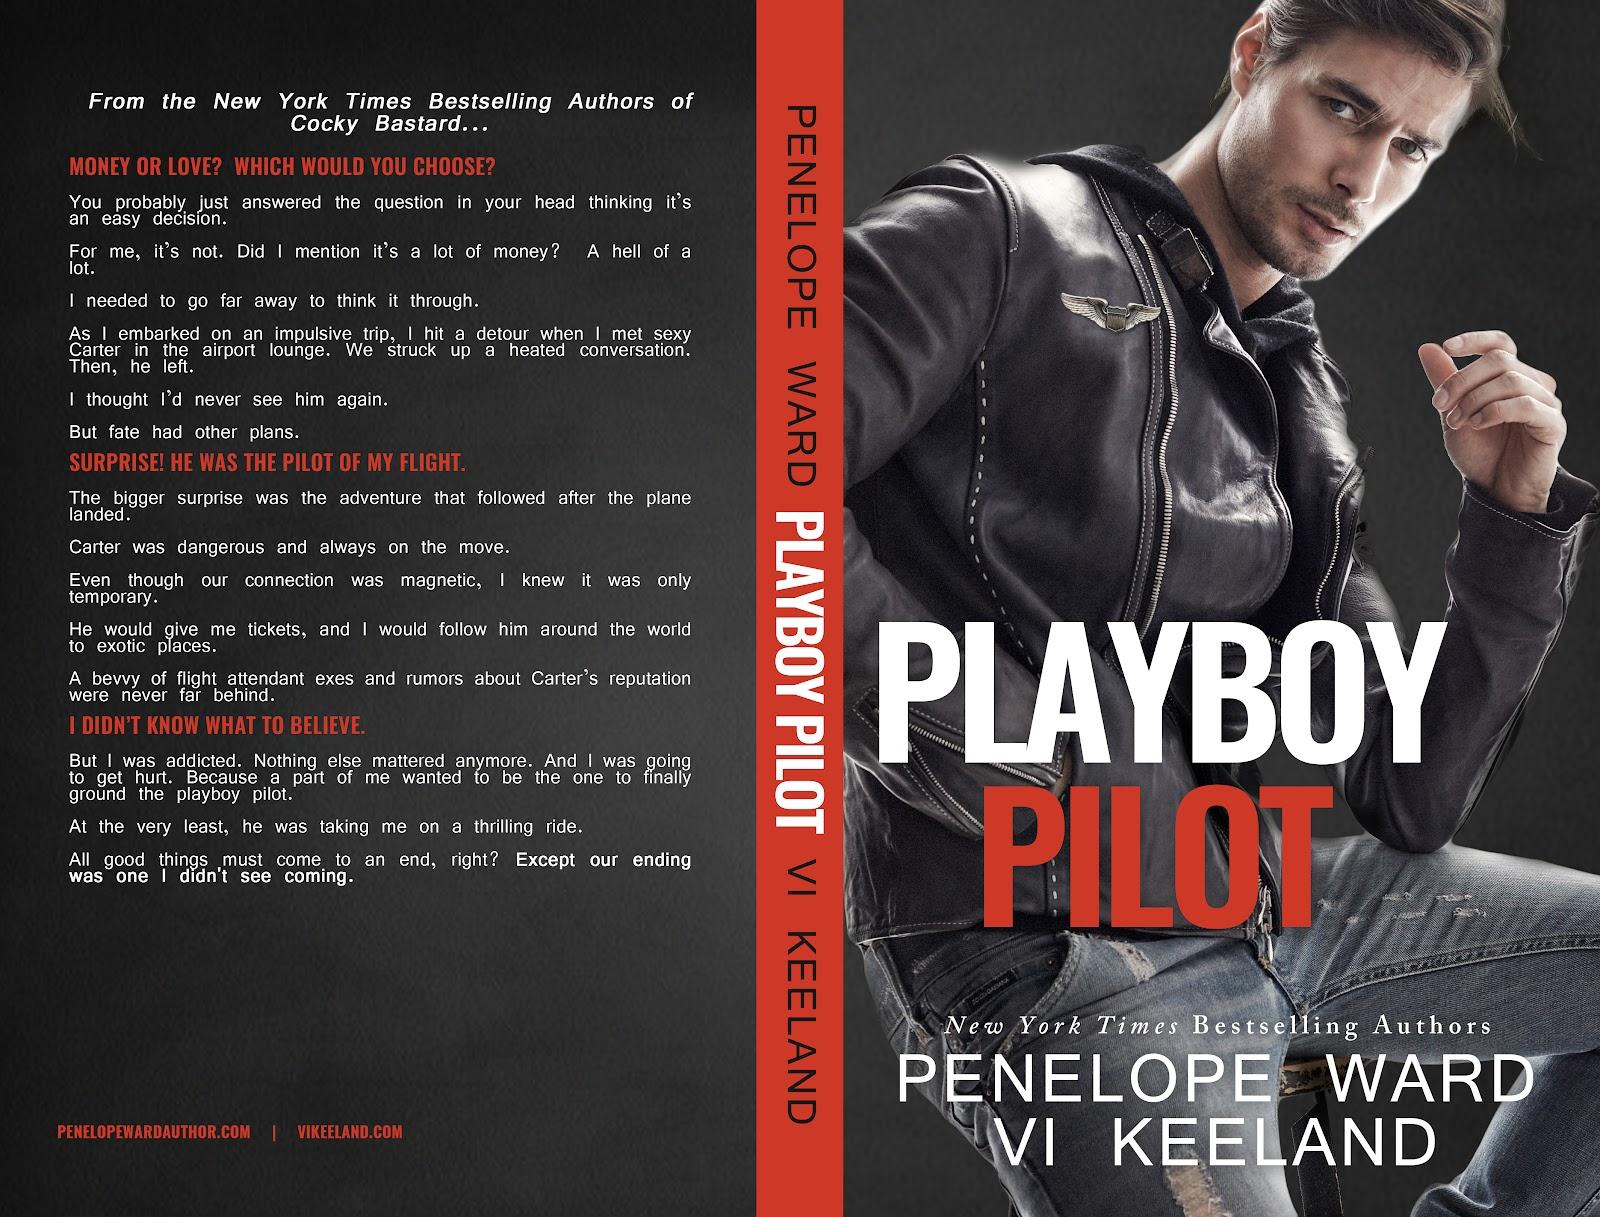 PlayboyPilotBookCover5x8_BW_264.jpg